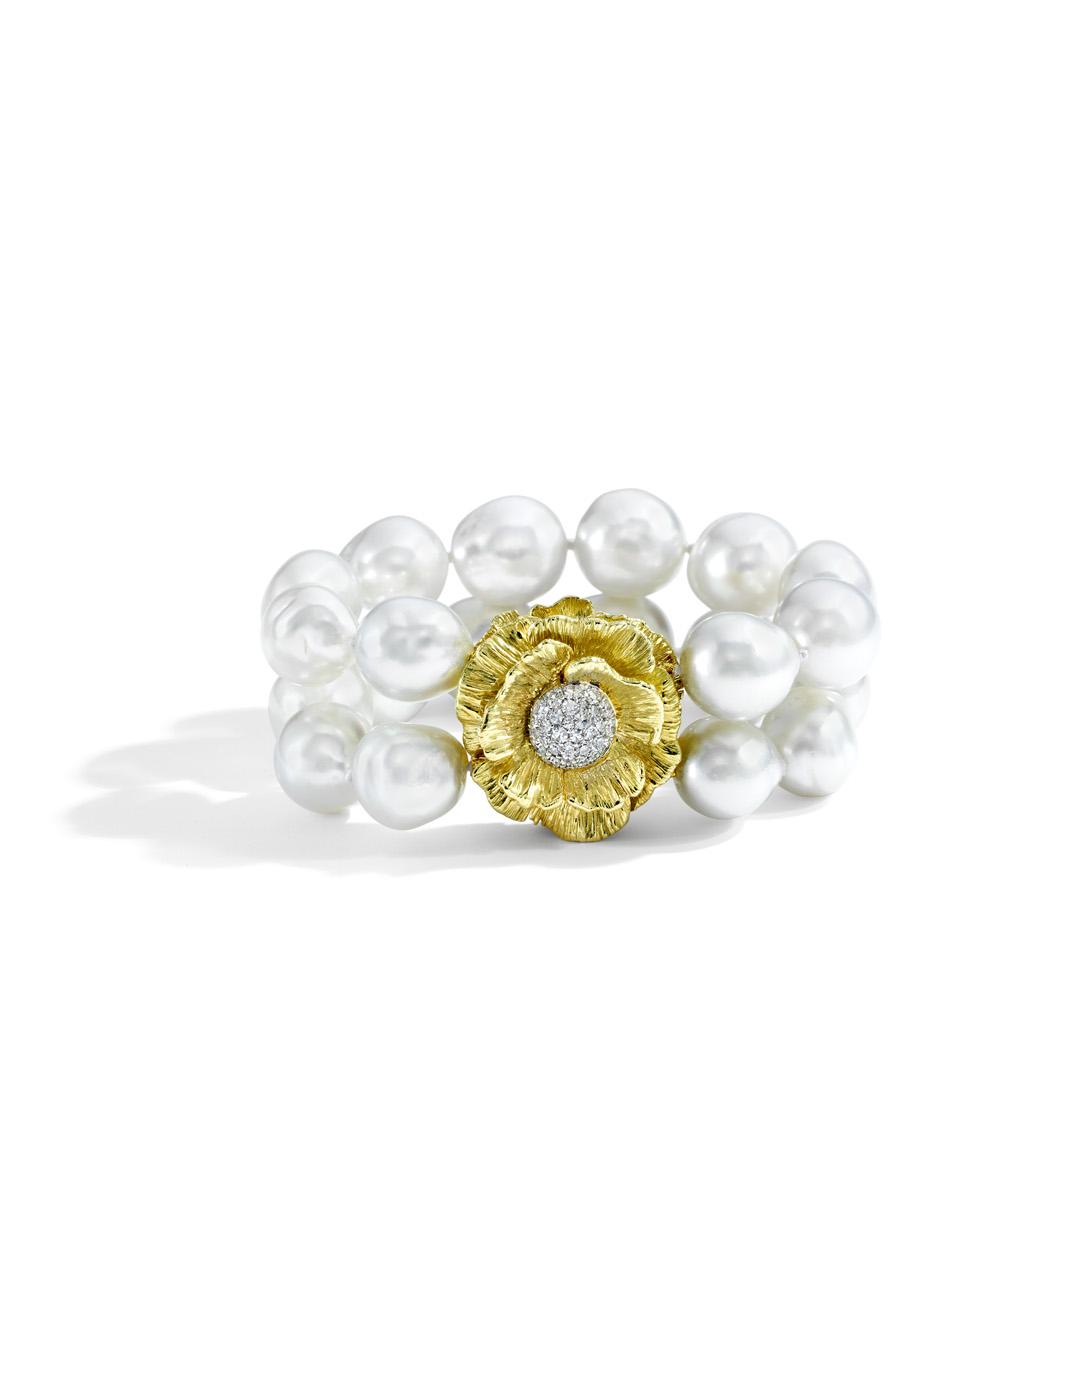 mish_jewelry_product_Poppy-Clasp-BR-2